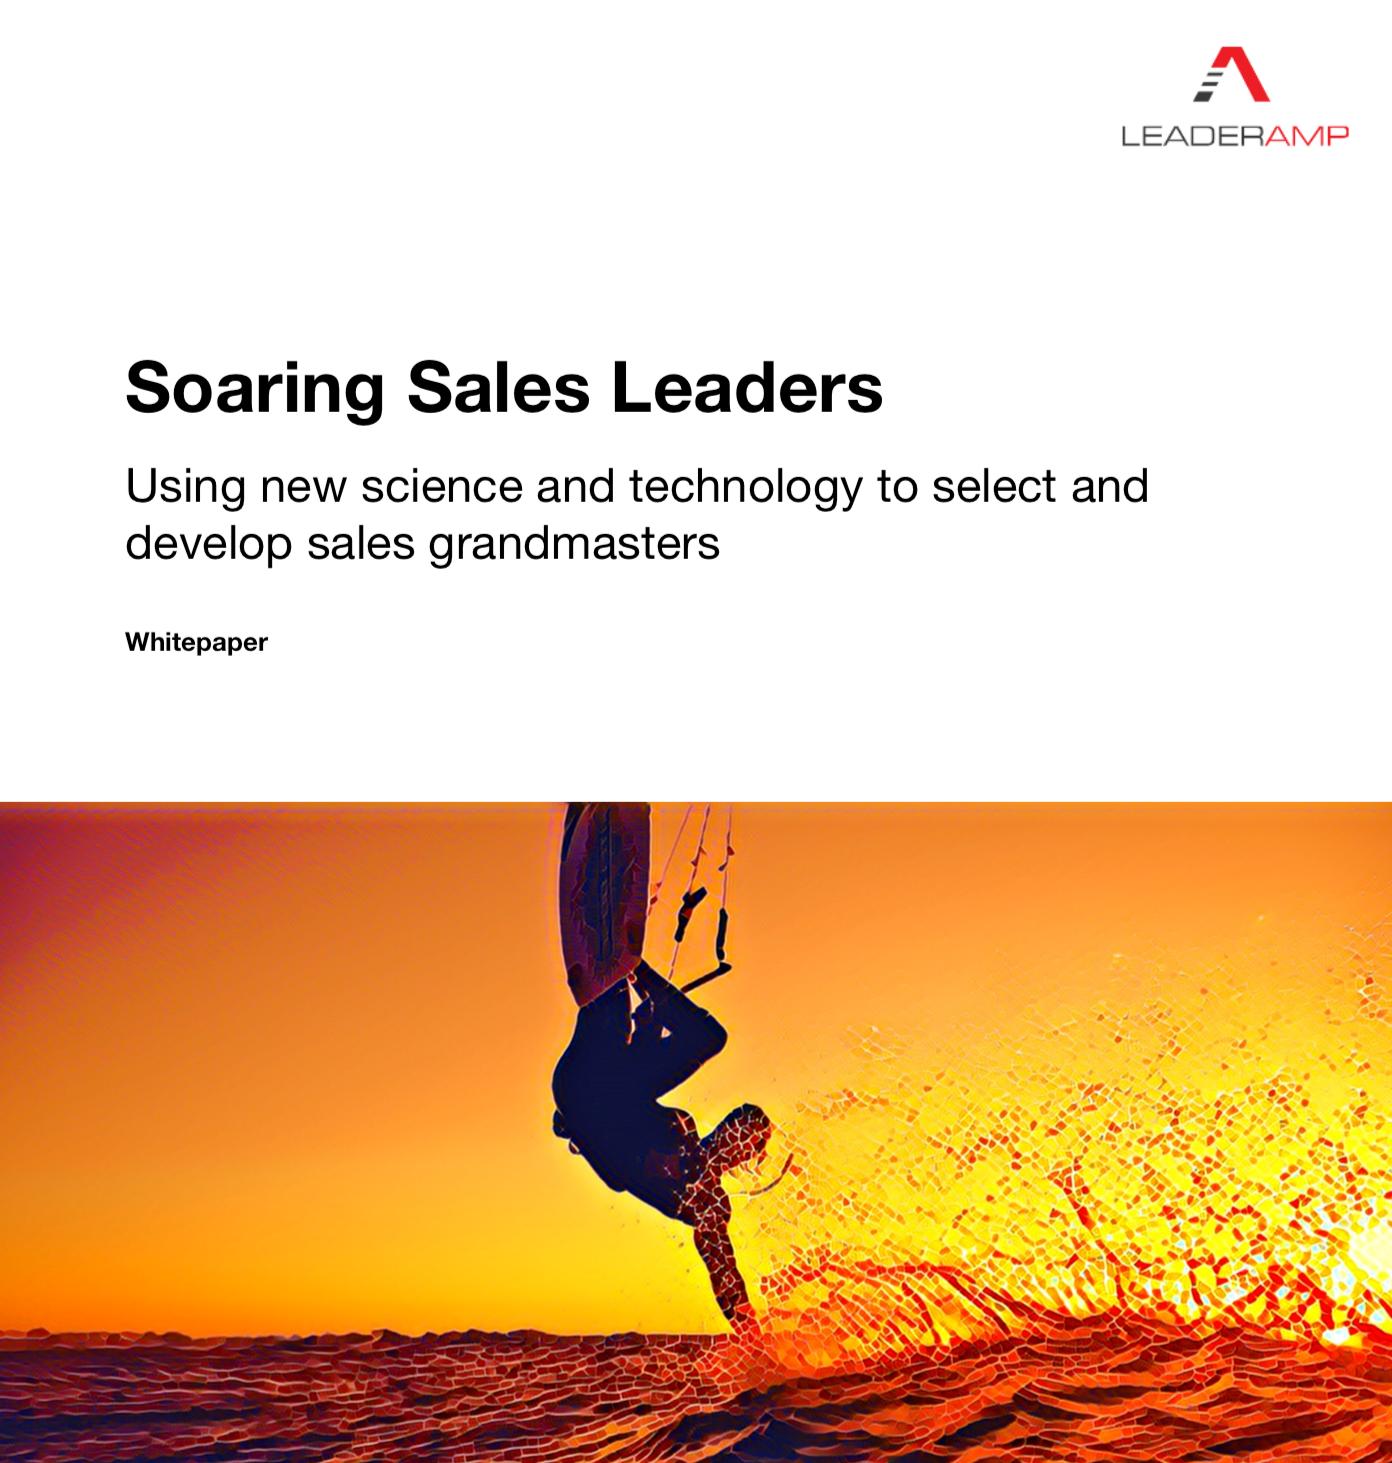 Soaring Sales Leaders Whitepaper Screenshot